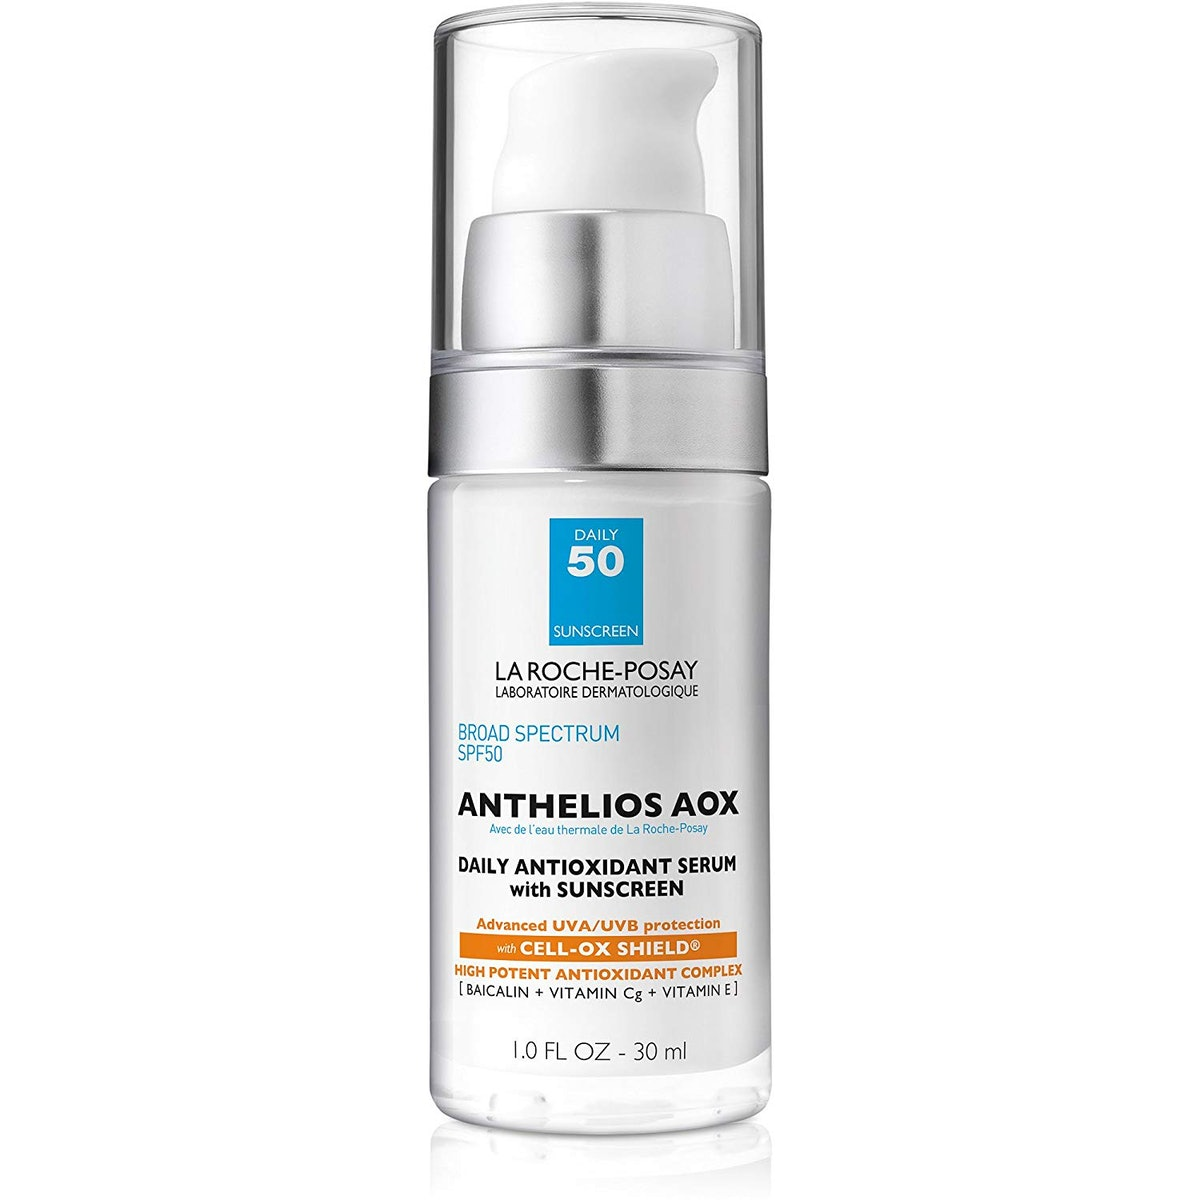 La Roche-Posay Anthelios 50 AOX Serum